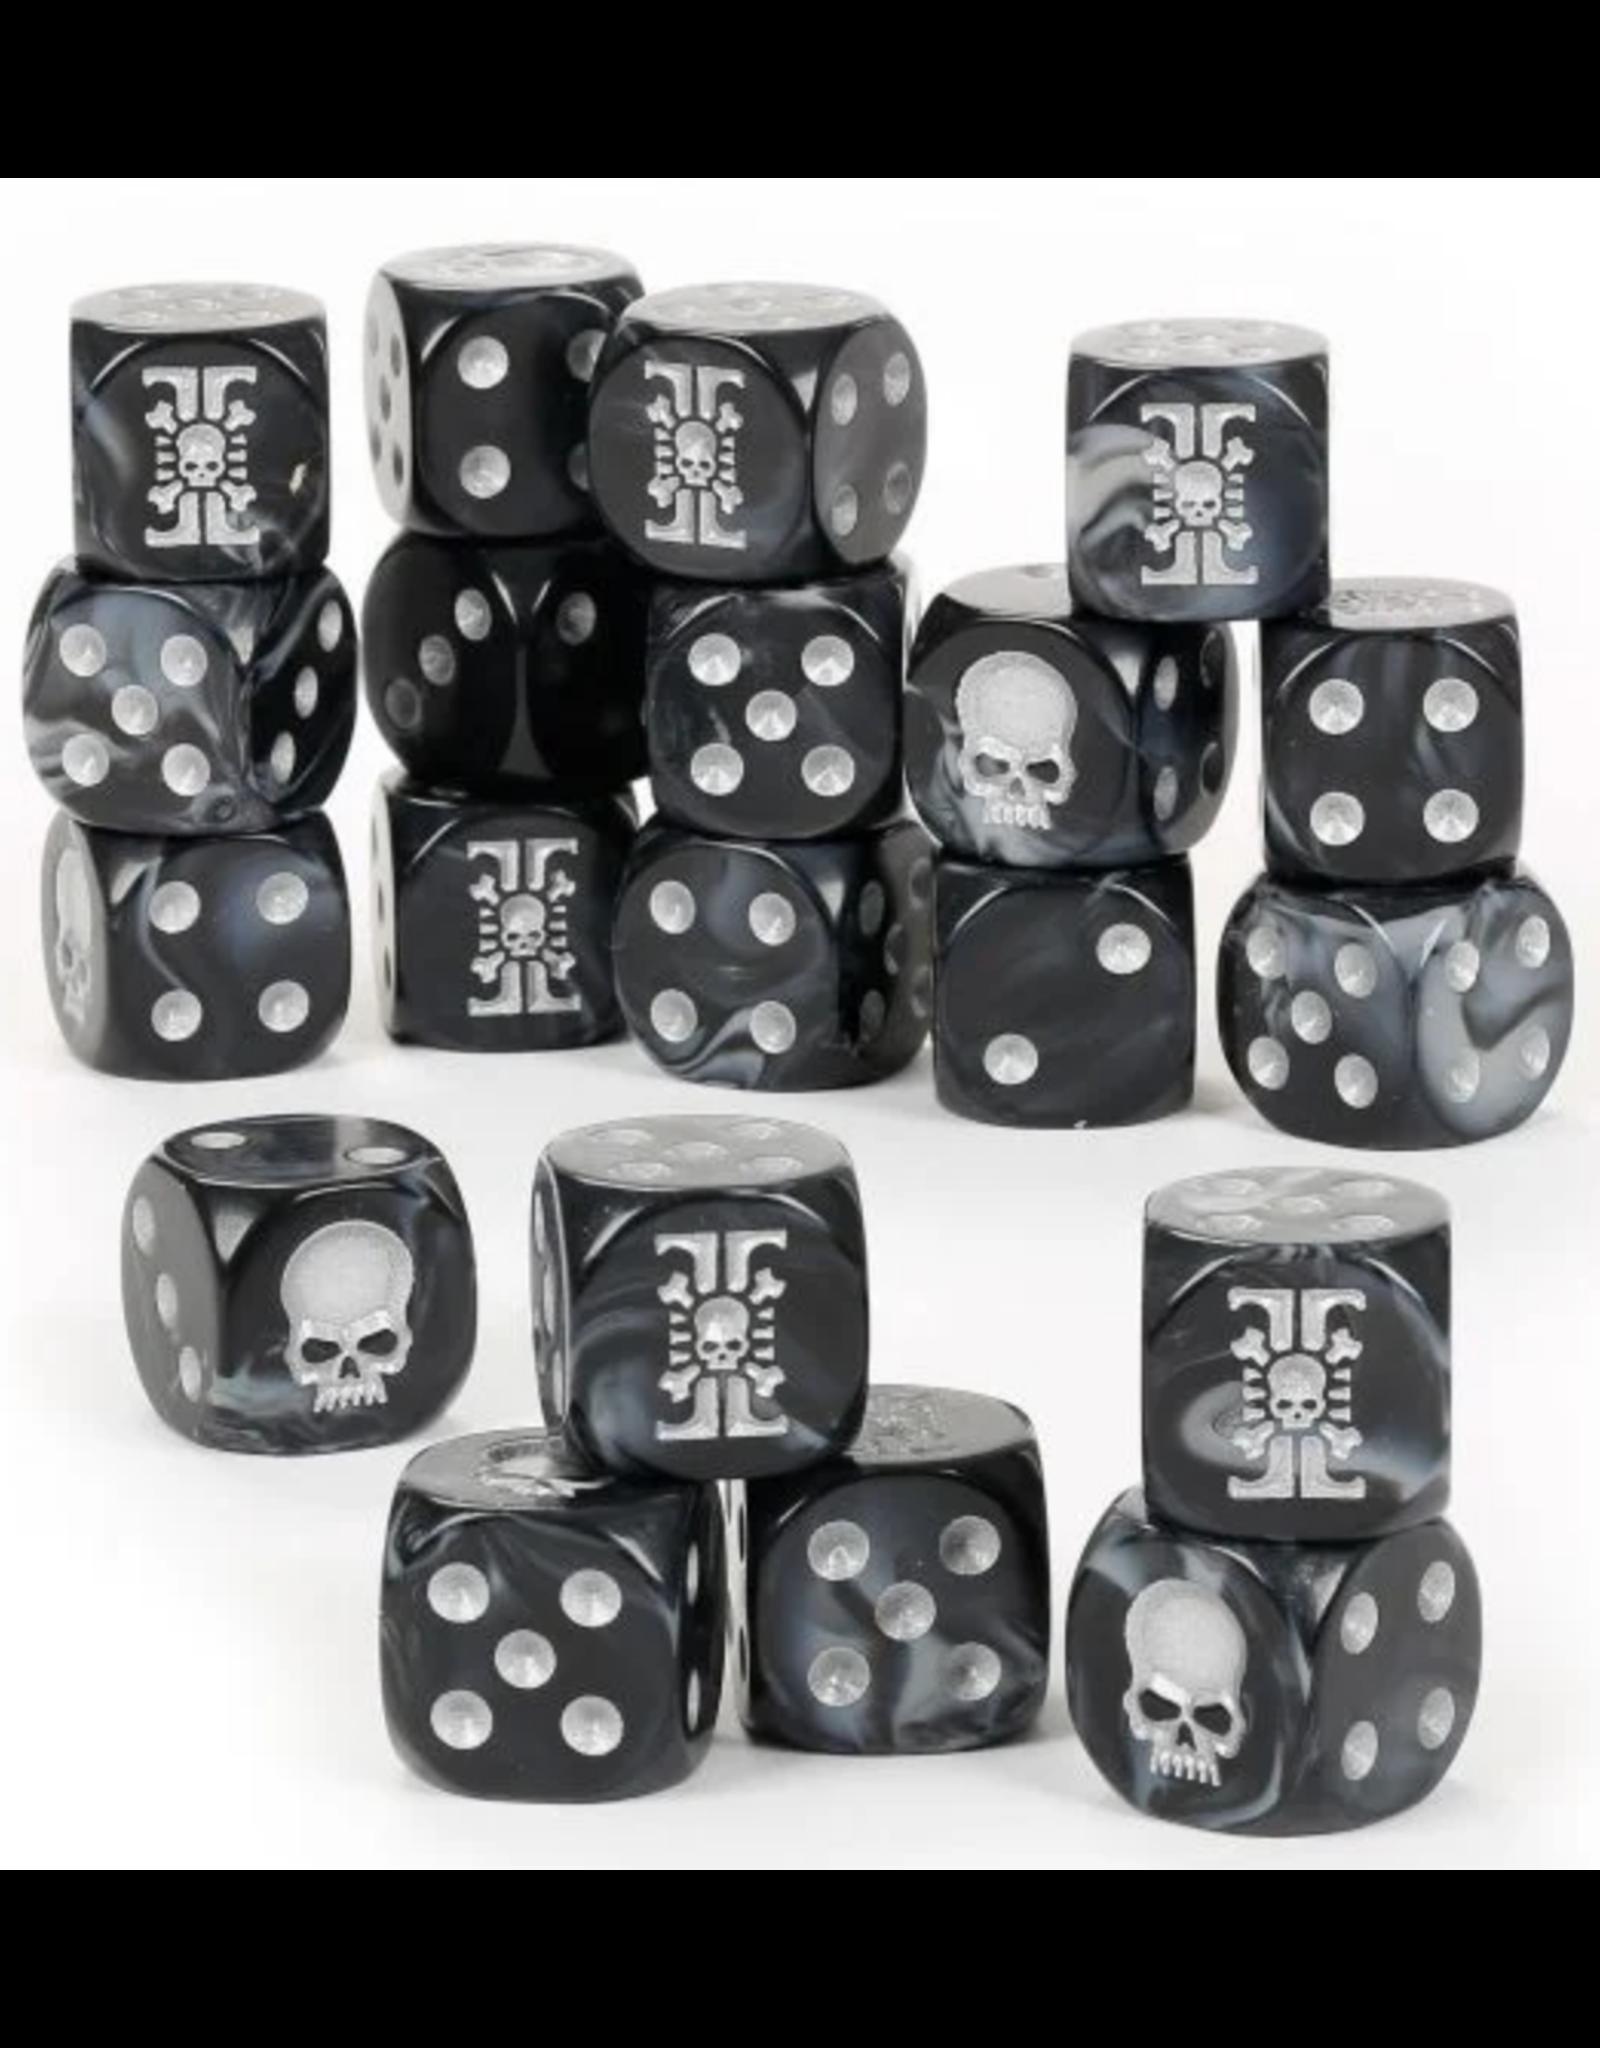 Games Workshop 40K Deathwatch Dice Set